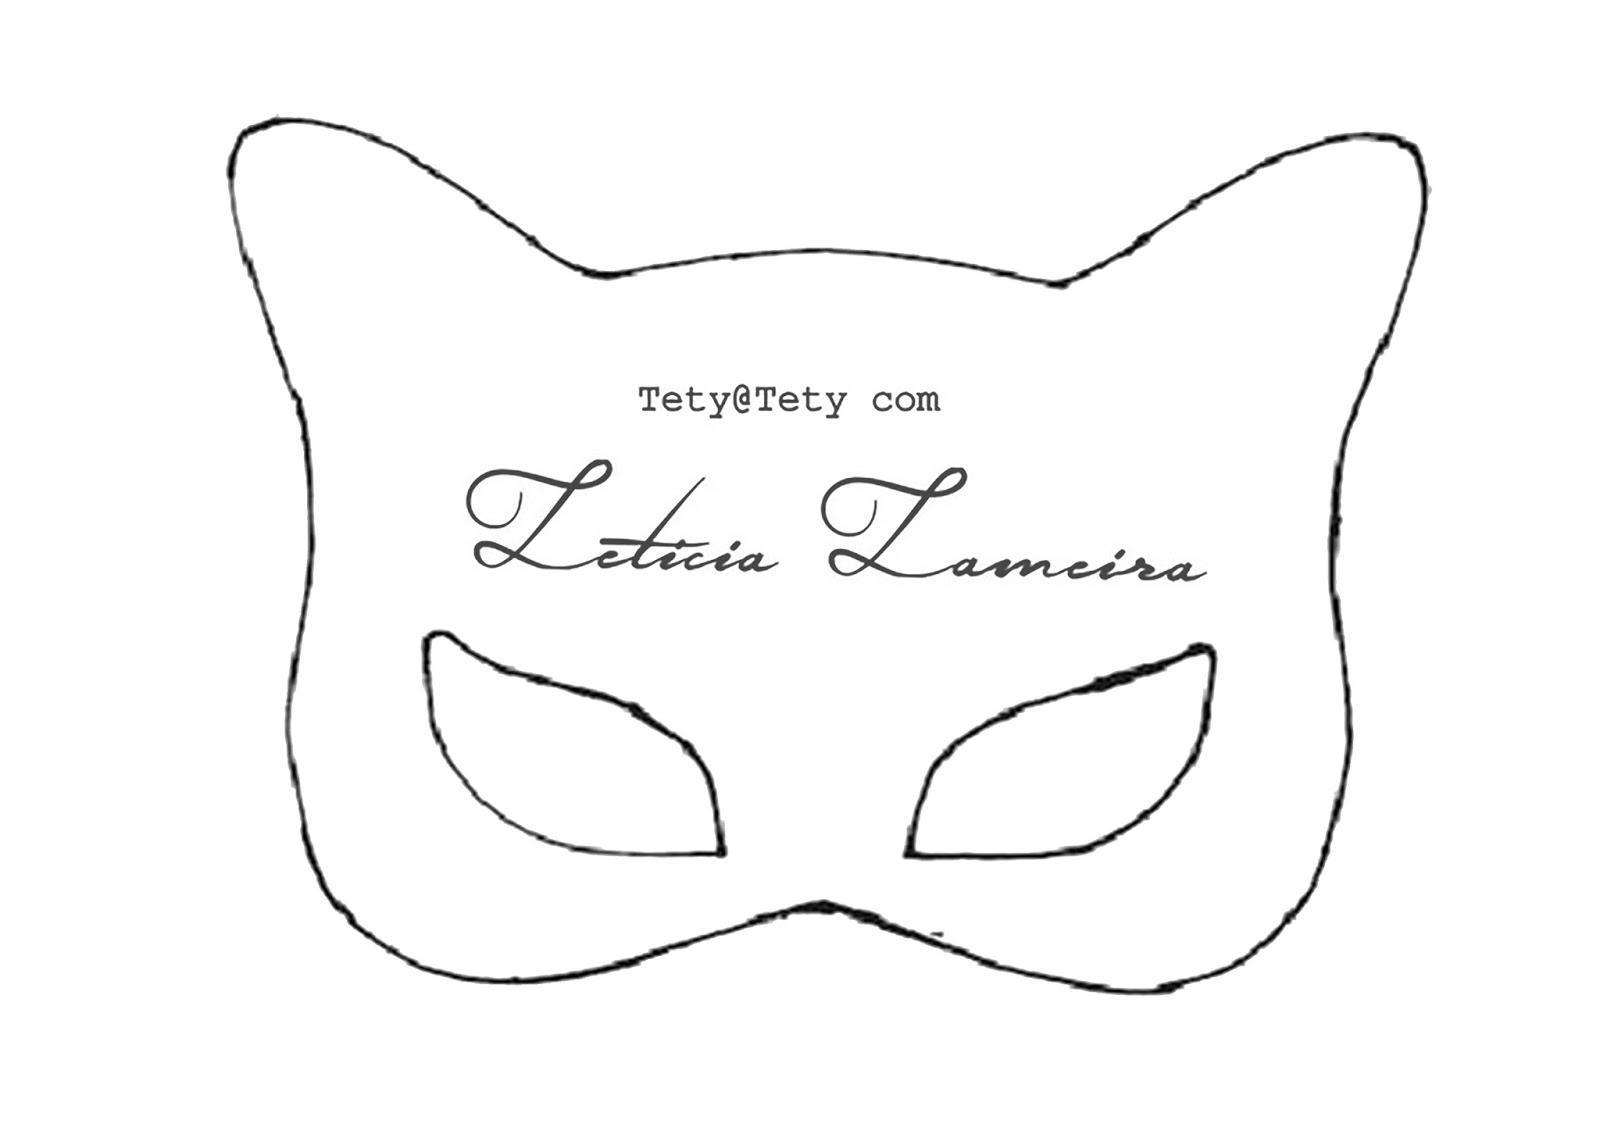 Mascara da mulher gato molde [PUNIQRANDLINE-(au-dating-names.txt) 56